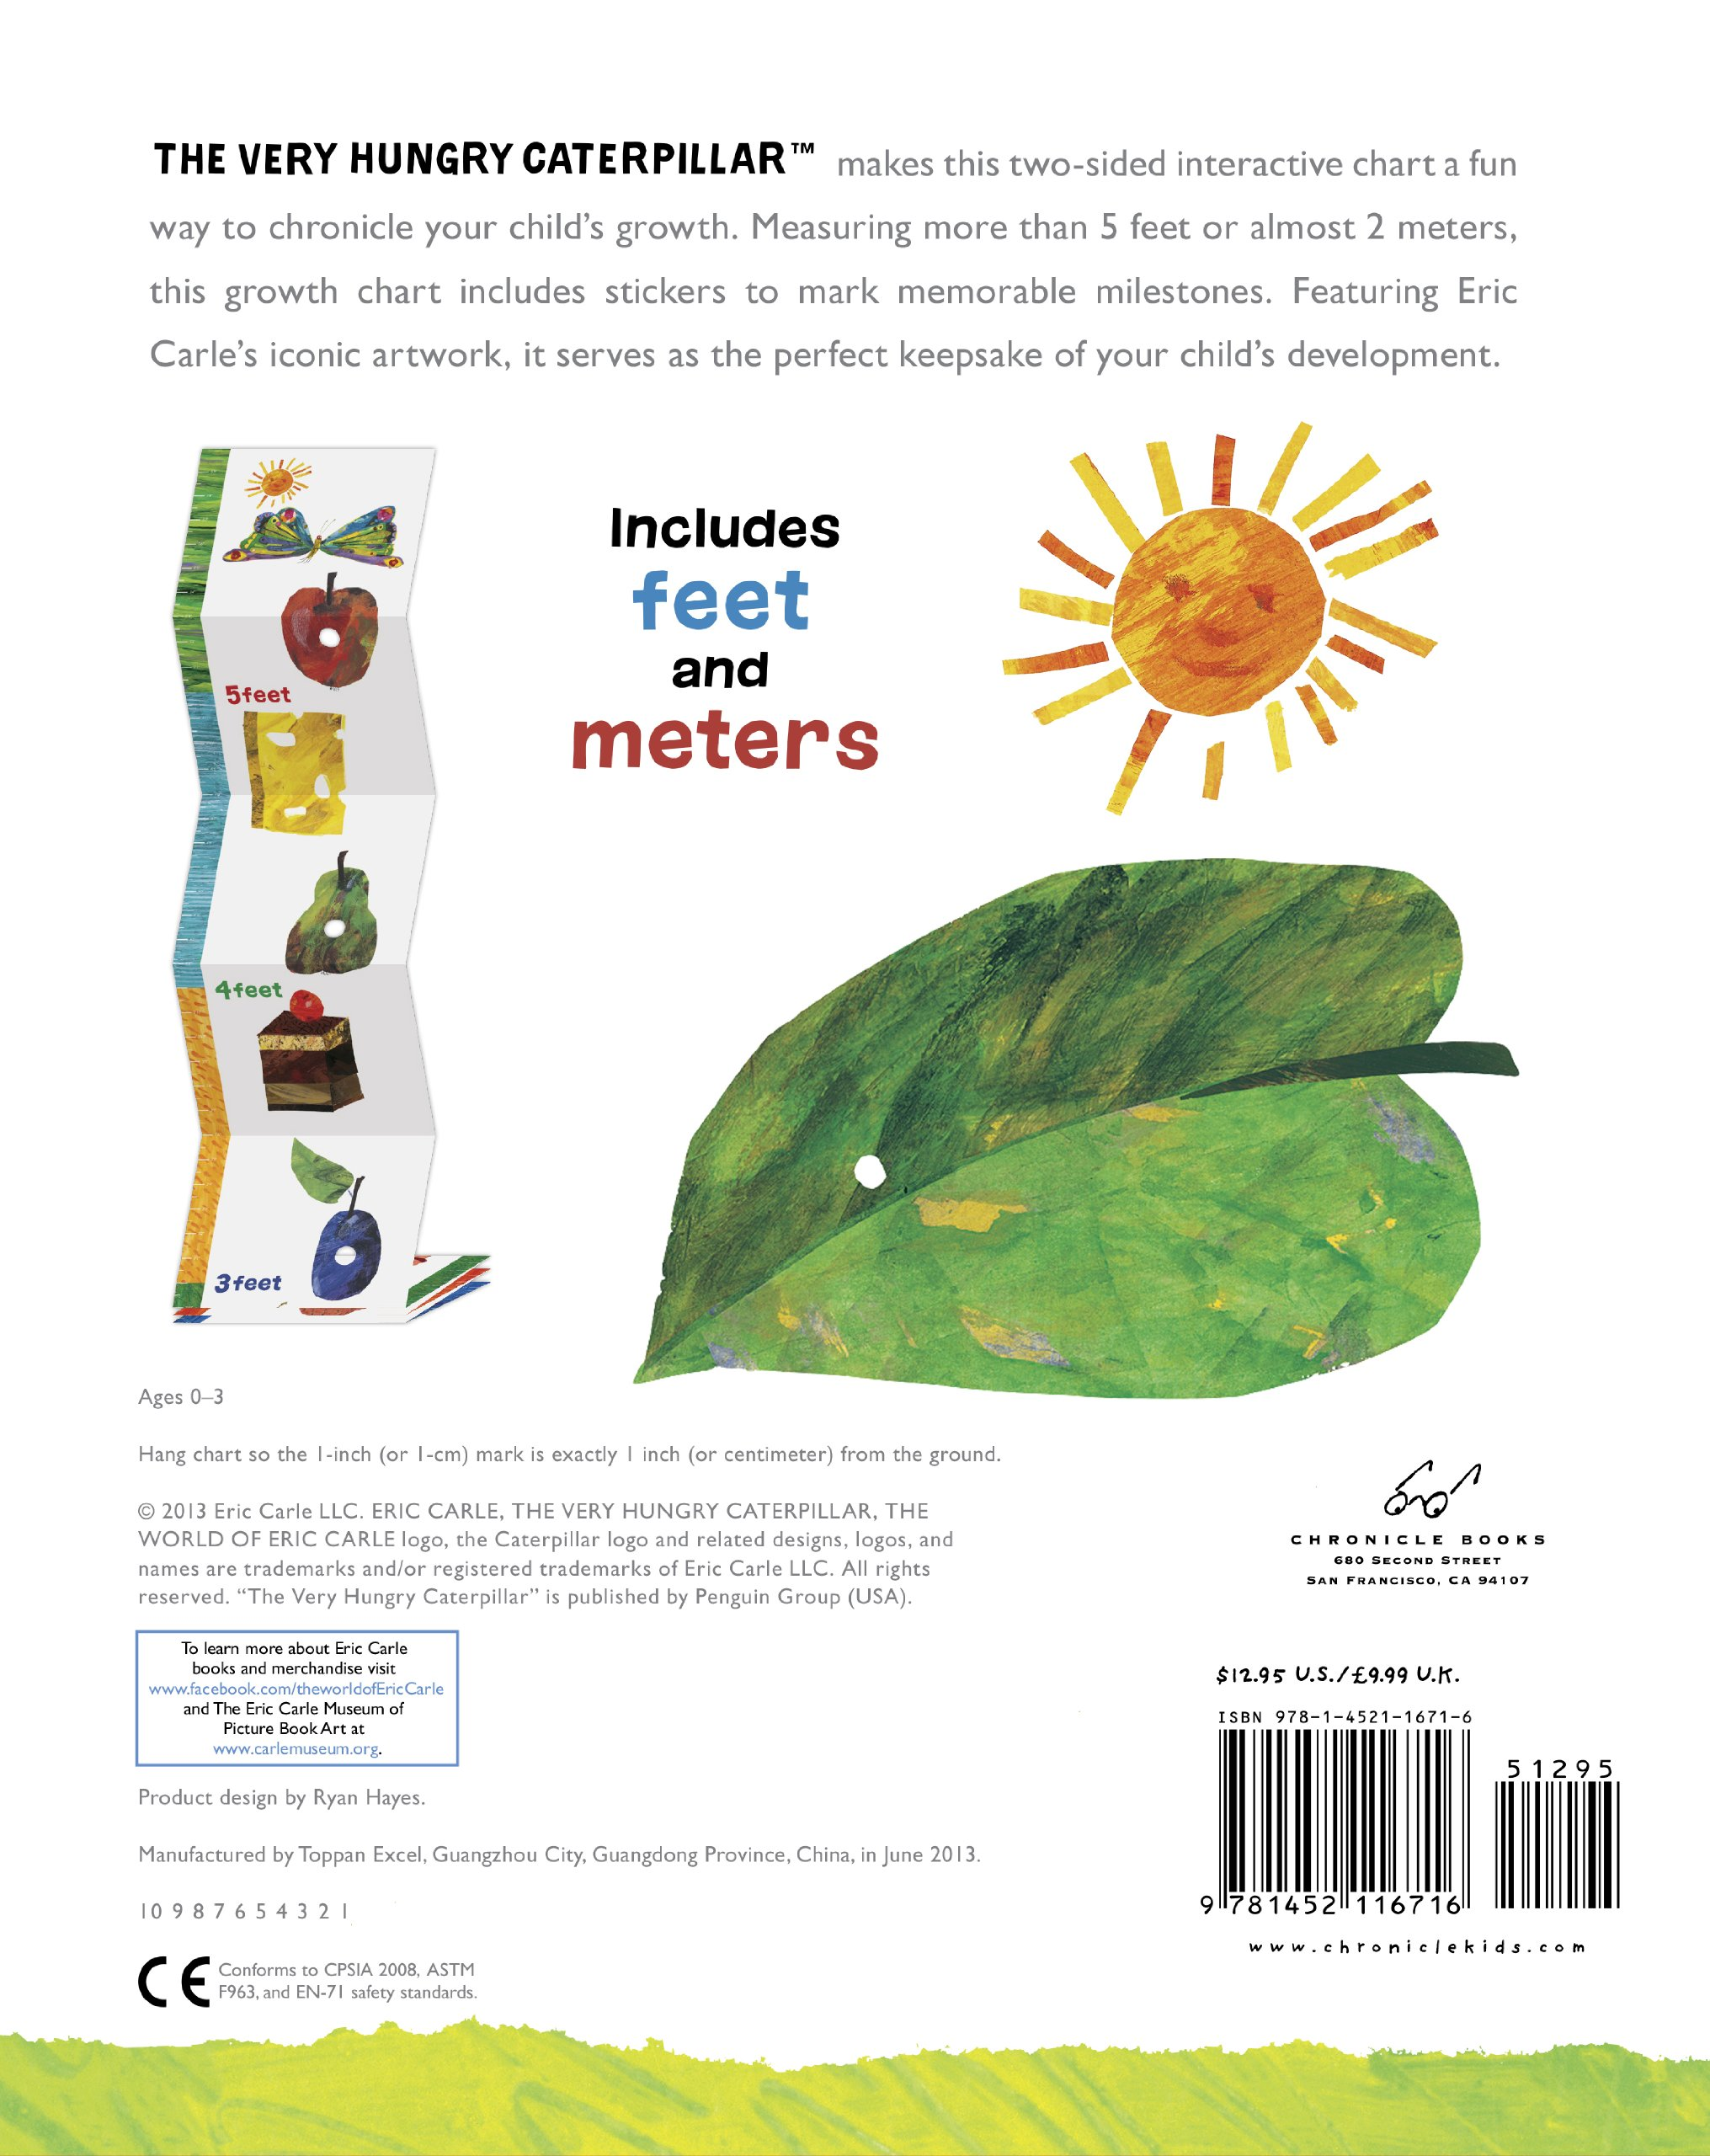 The world of eric carletm the very hungry caterpillartm growth the world of eric carletm the very hungry caterpillartm growth chart chronicle books 9781452116716 amazon books nvjuhfo Choice Image